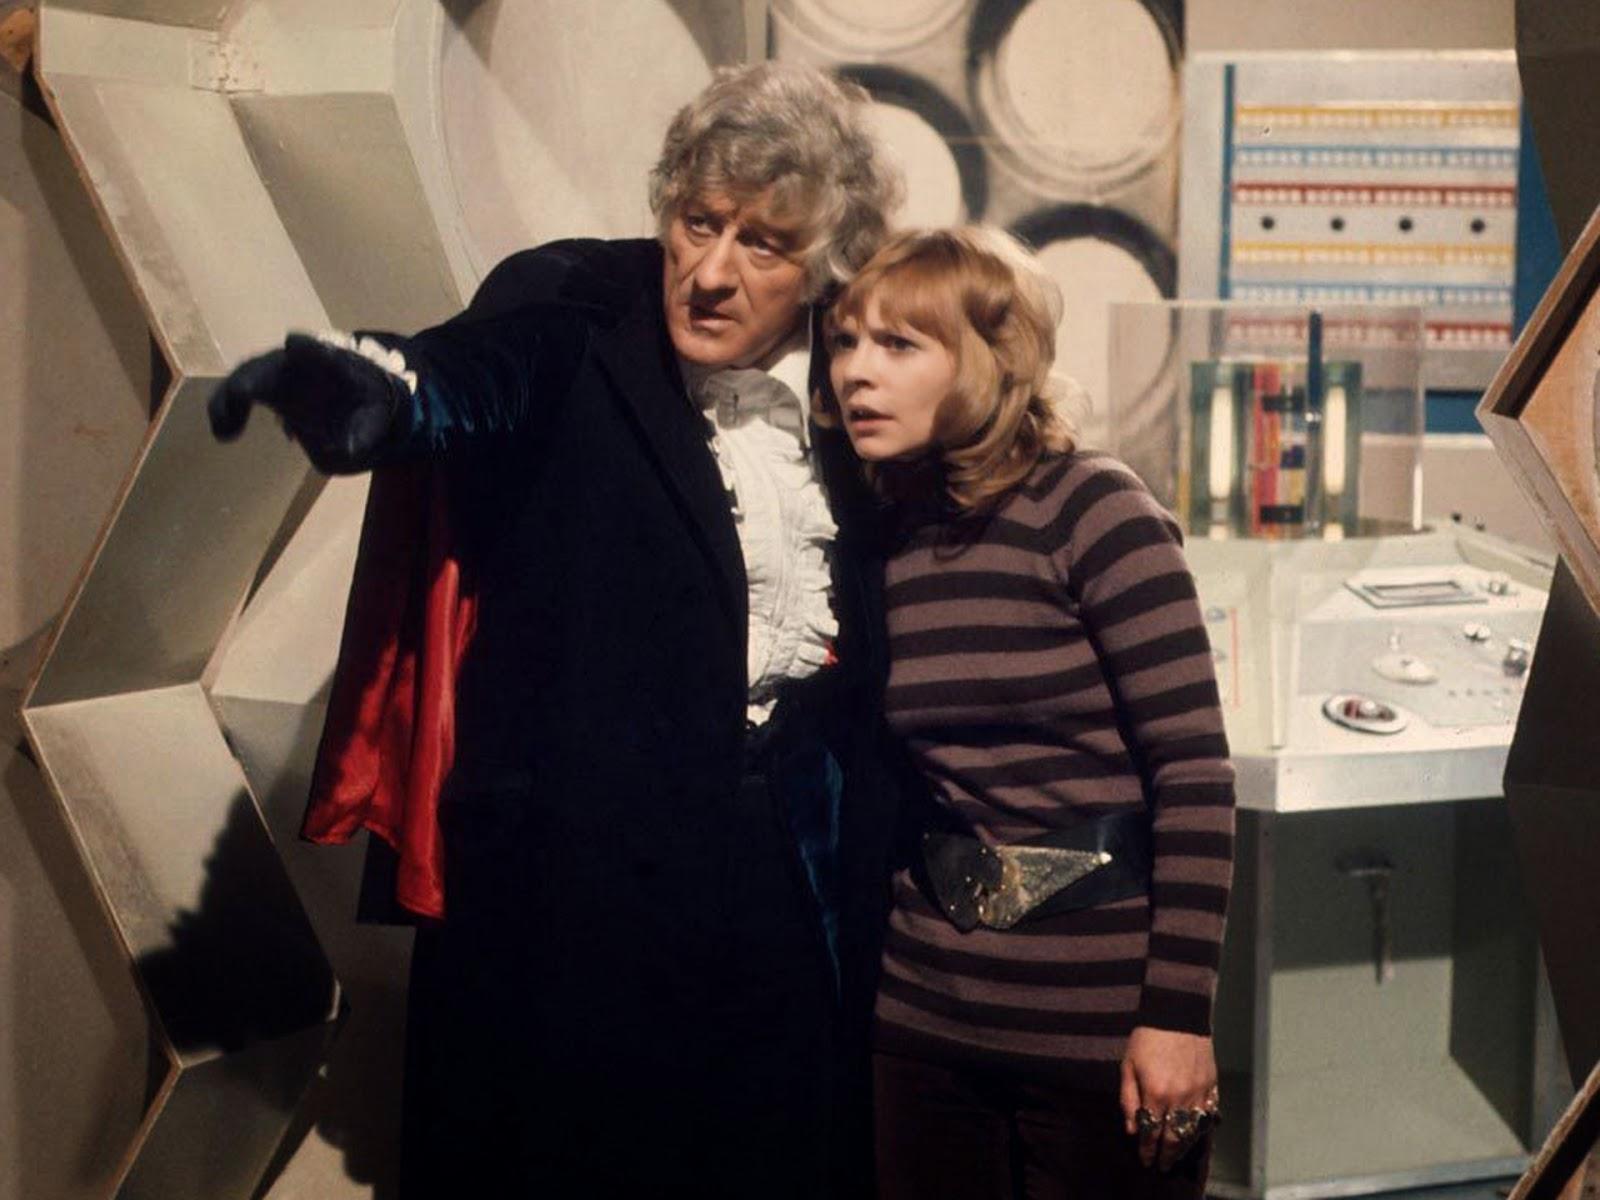 M: Doctor Who: Day of the Daleks (Story 60) Katy manning dalek photo